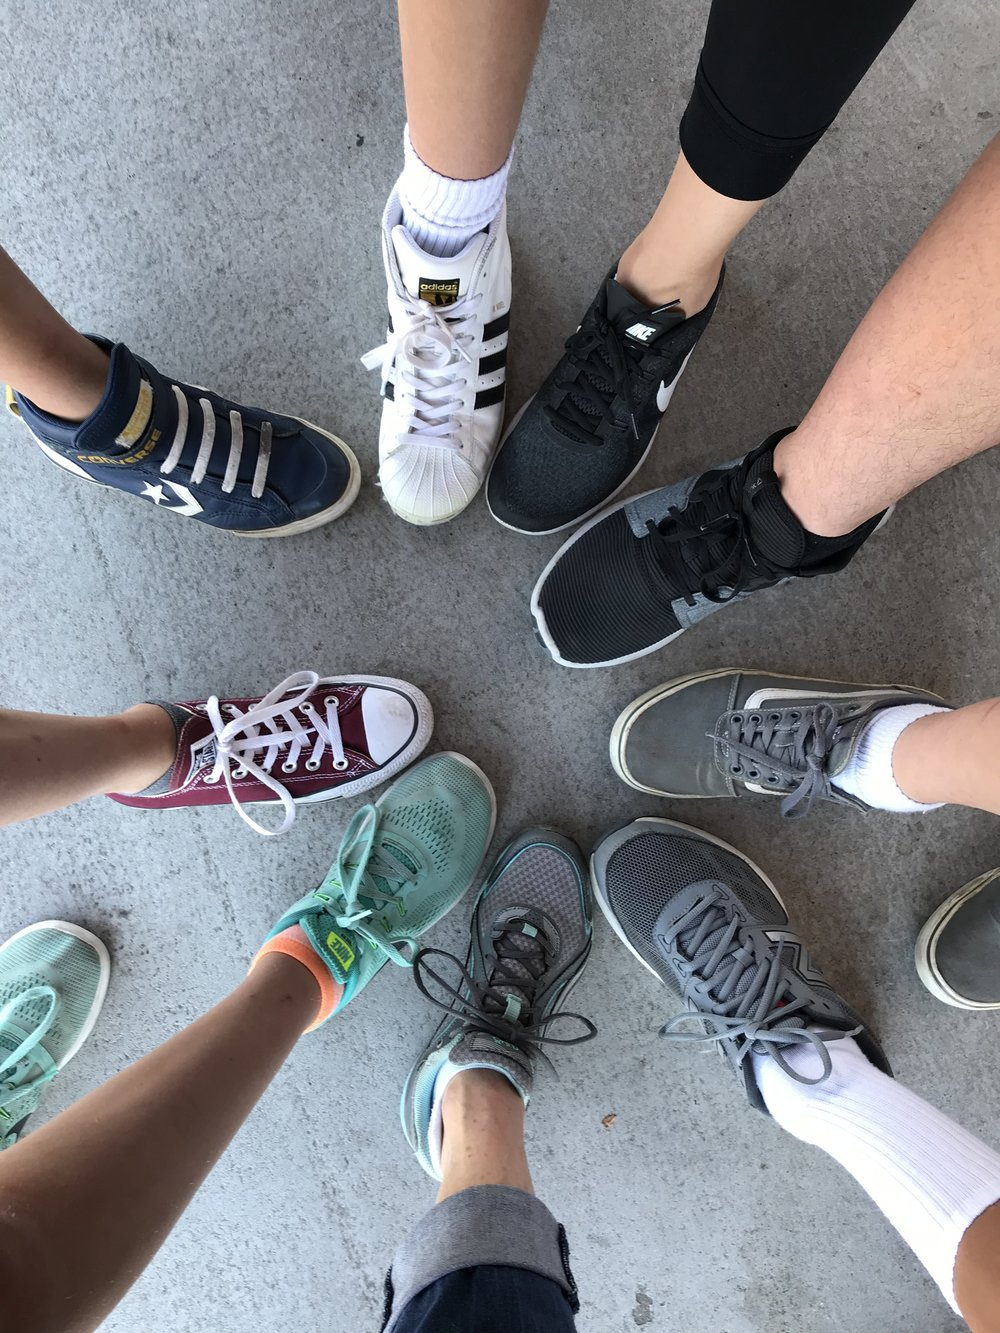 Feet on the platform